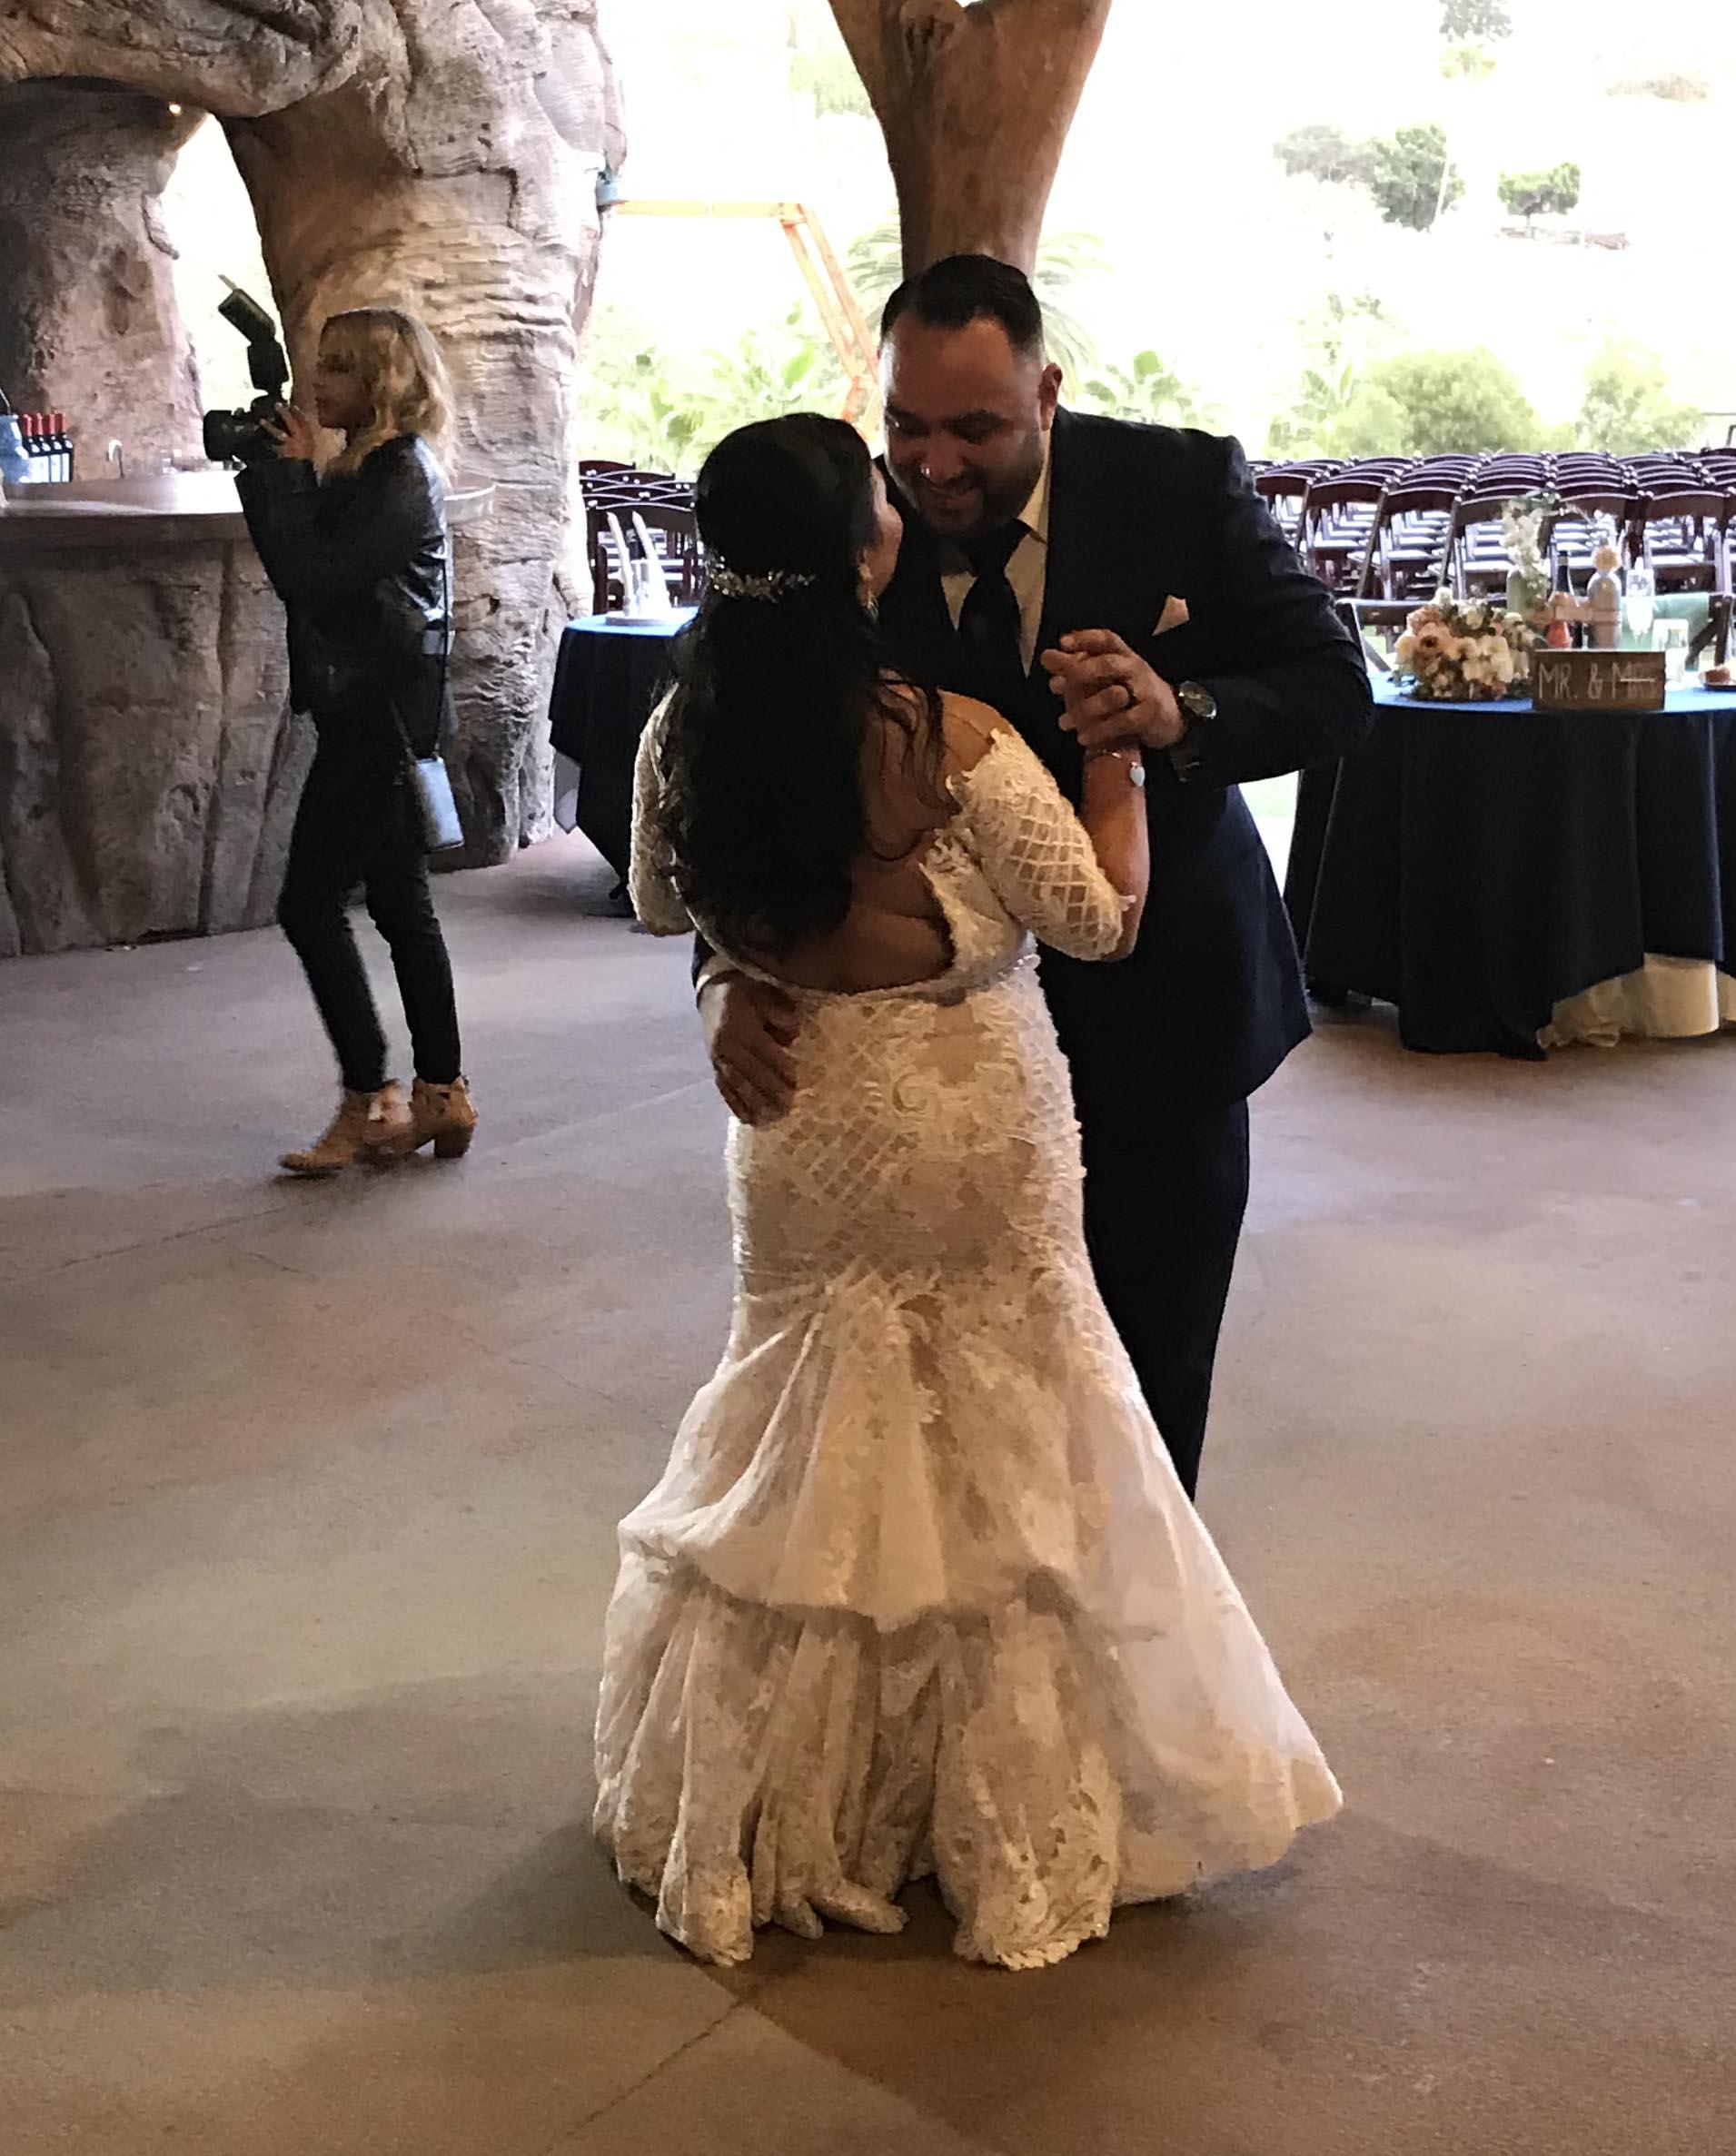 San Diego wedding DJ at the Safari park - Becks Entertainment